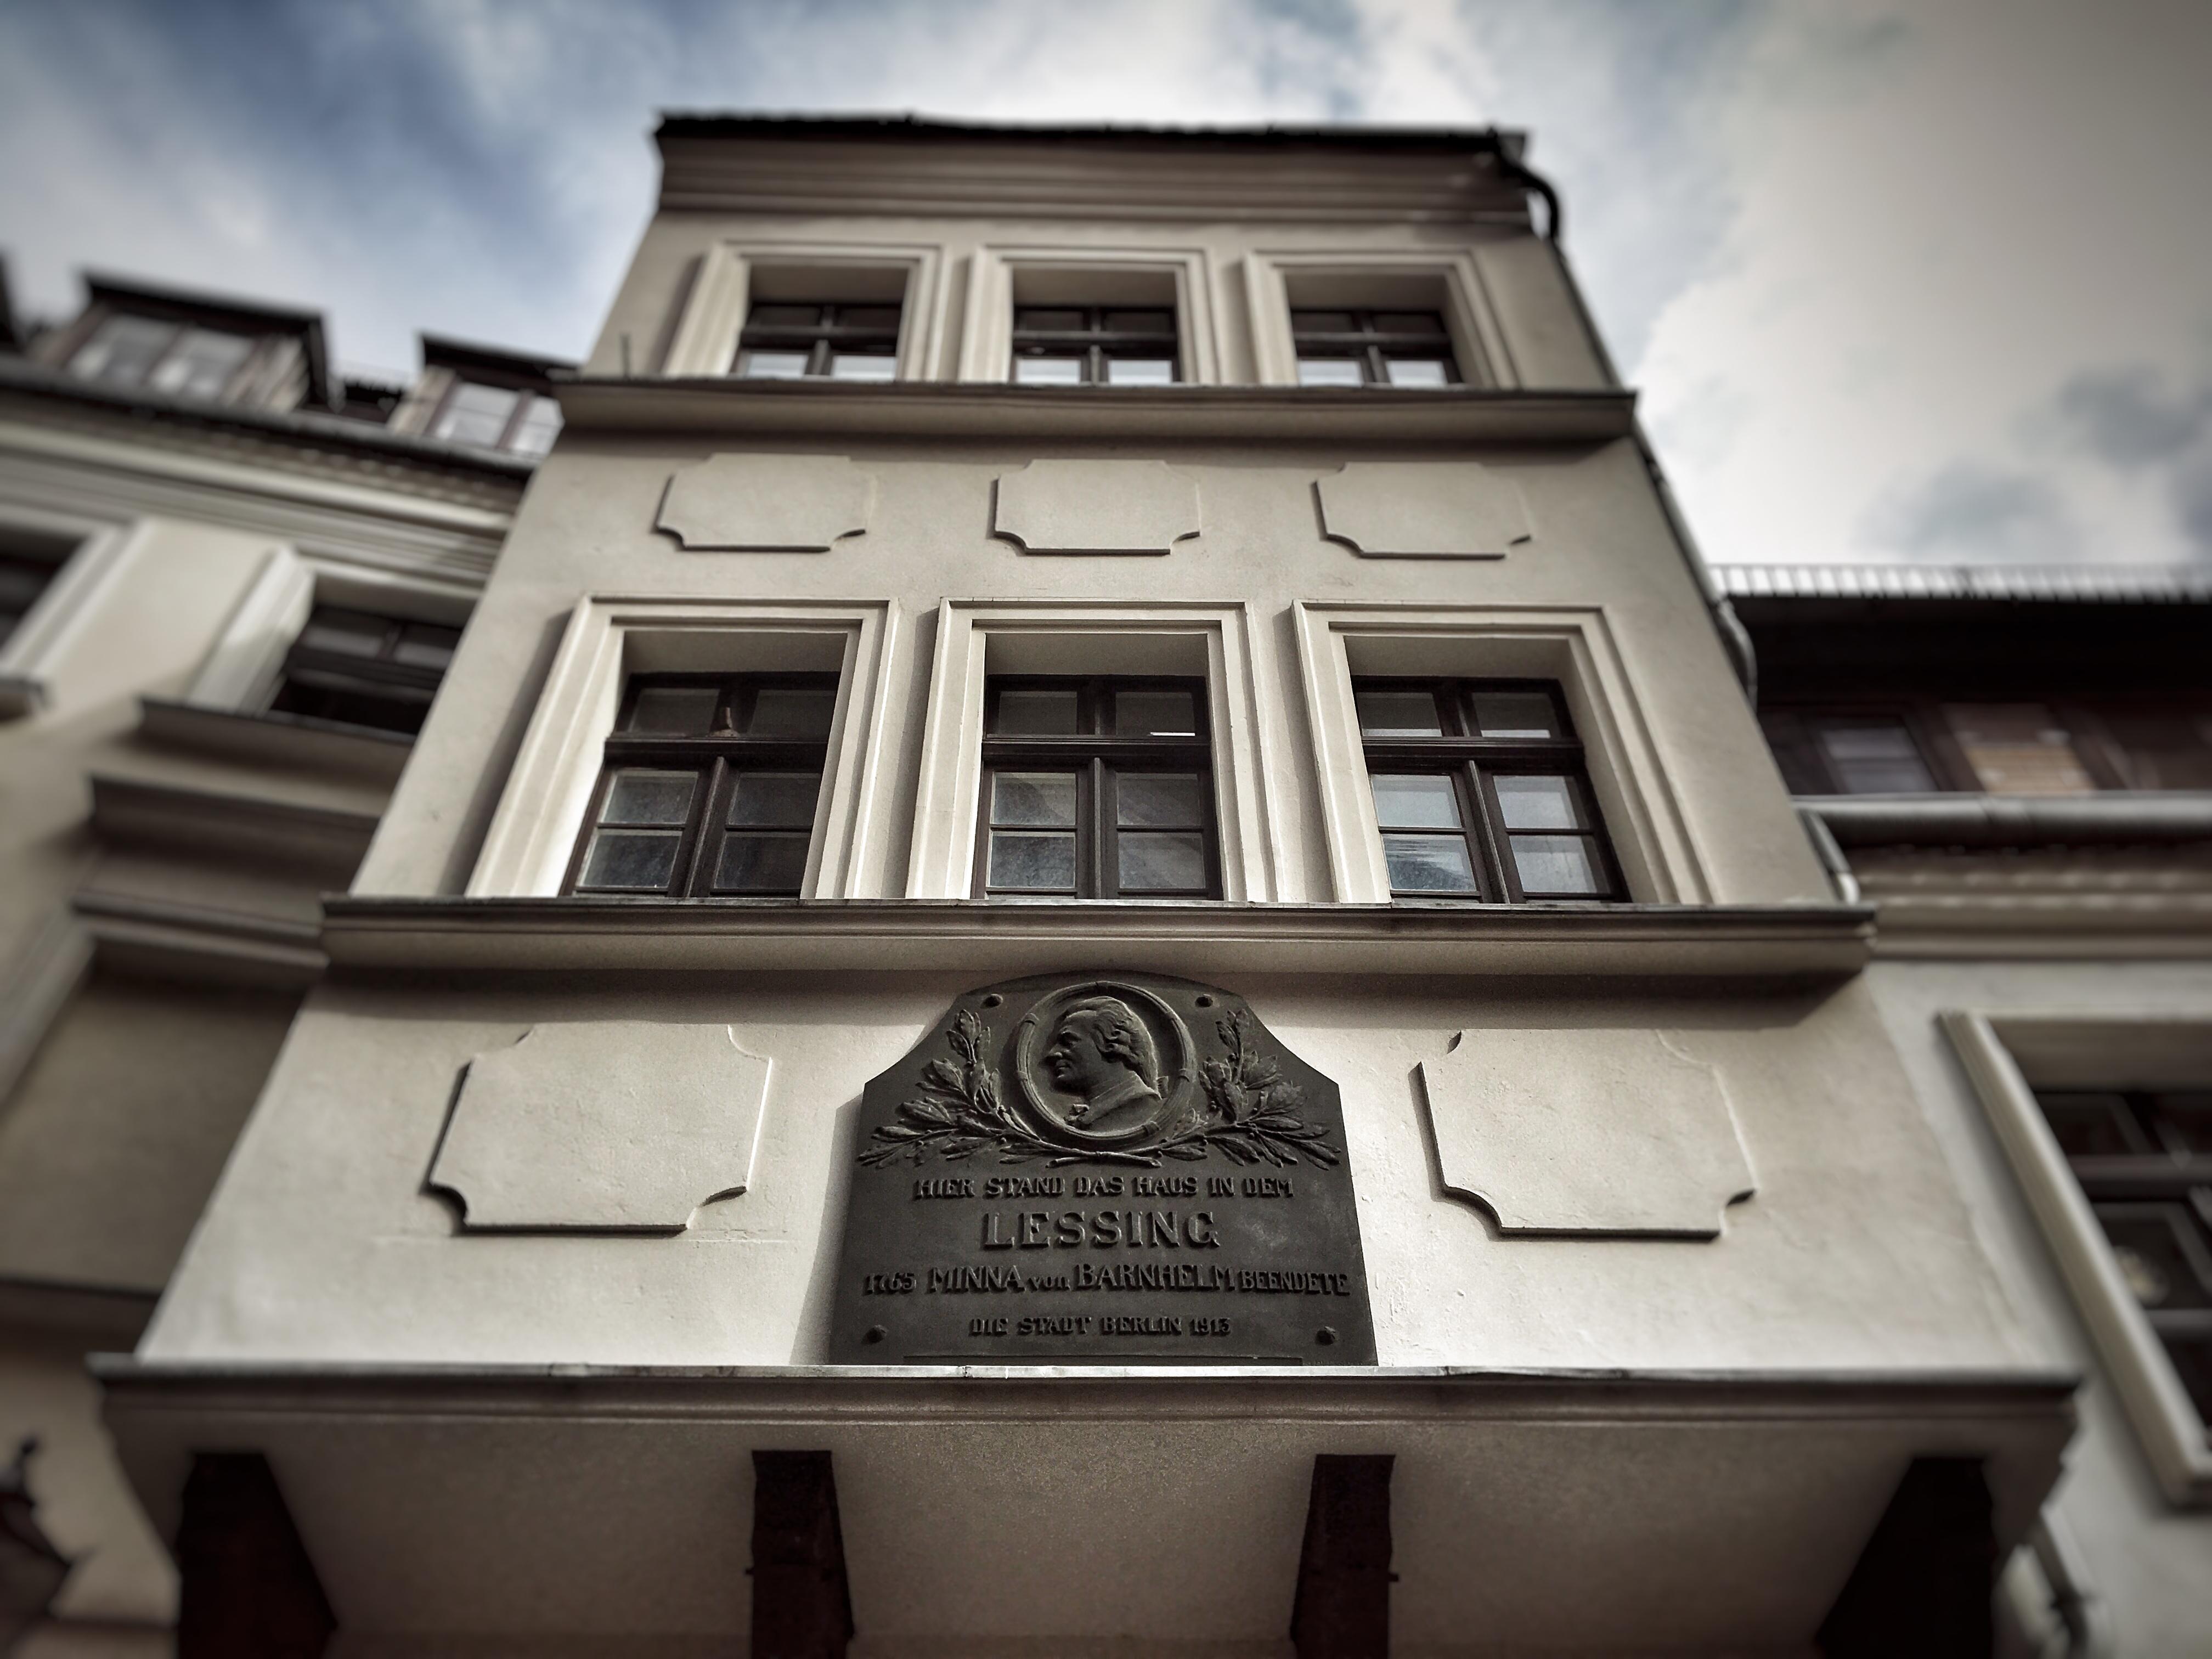 Berliner Nikolaiviertel Lessinghaus